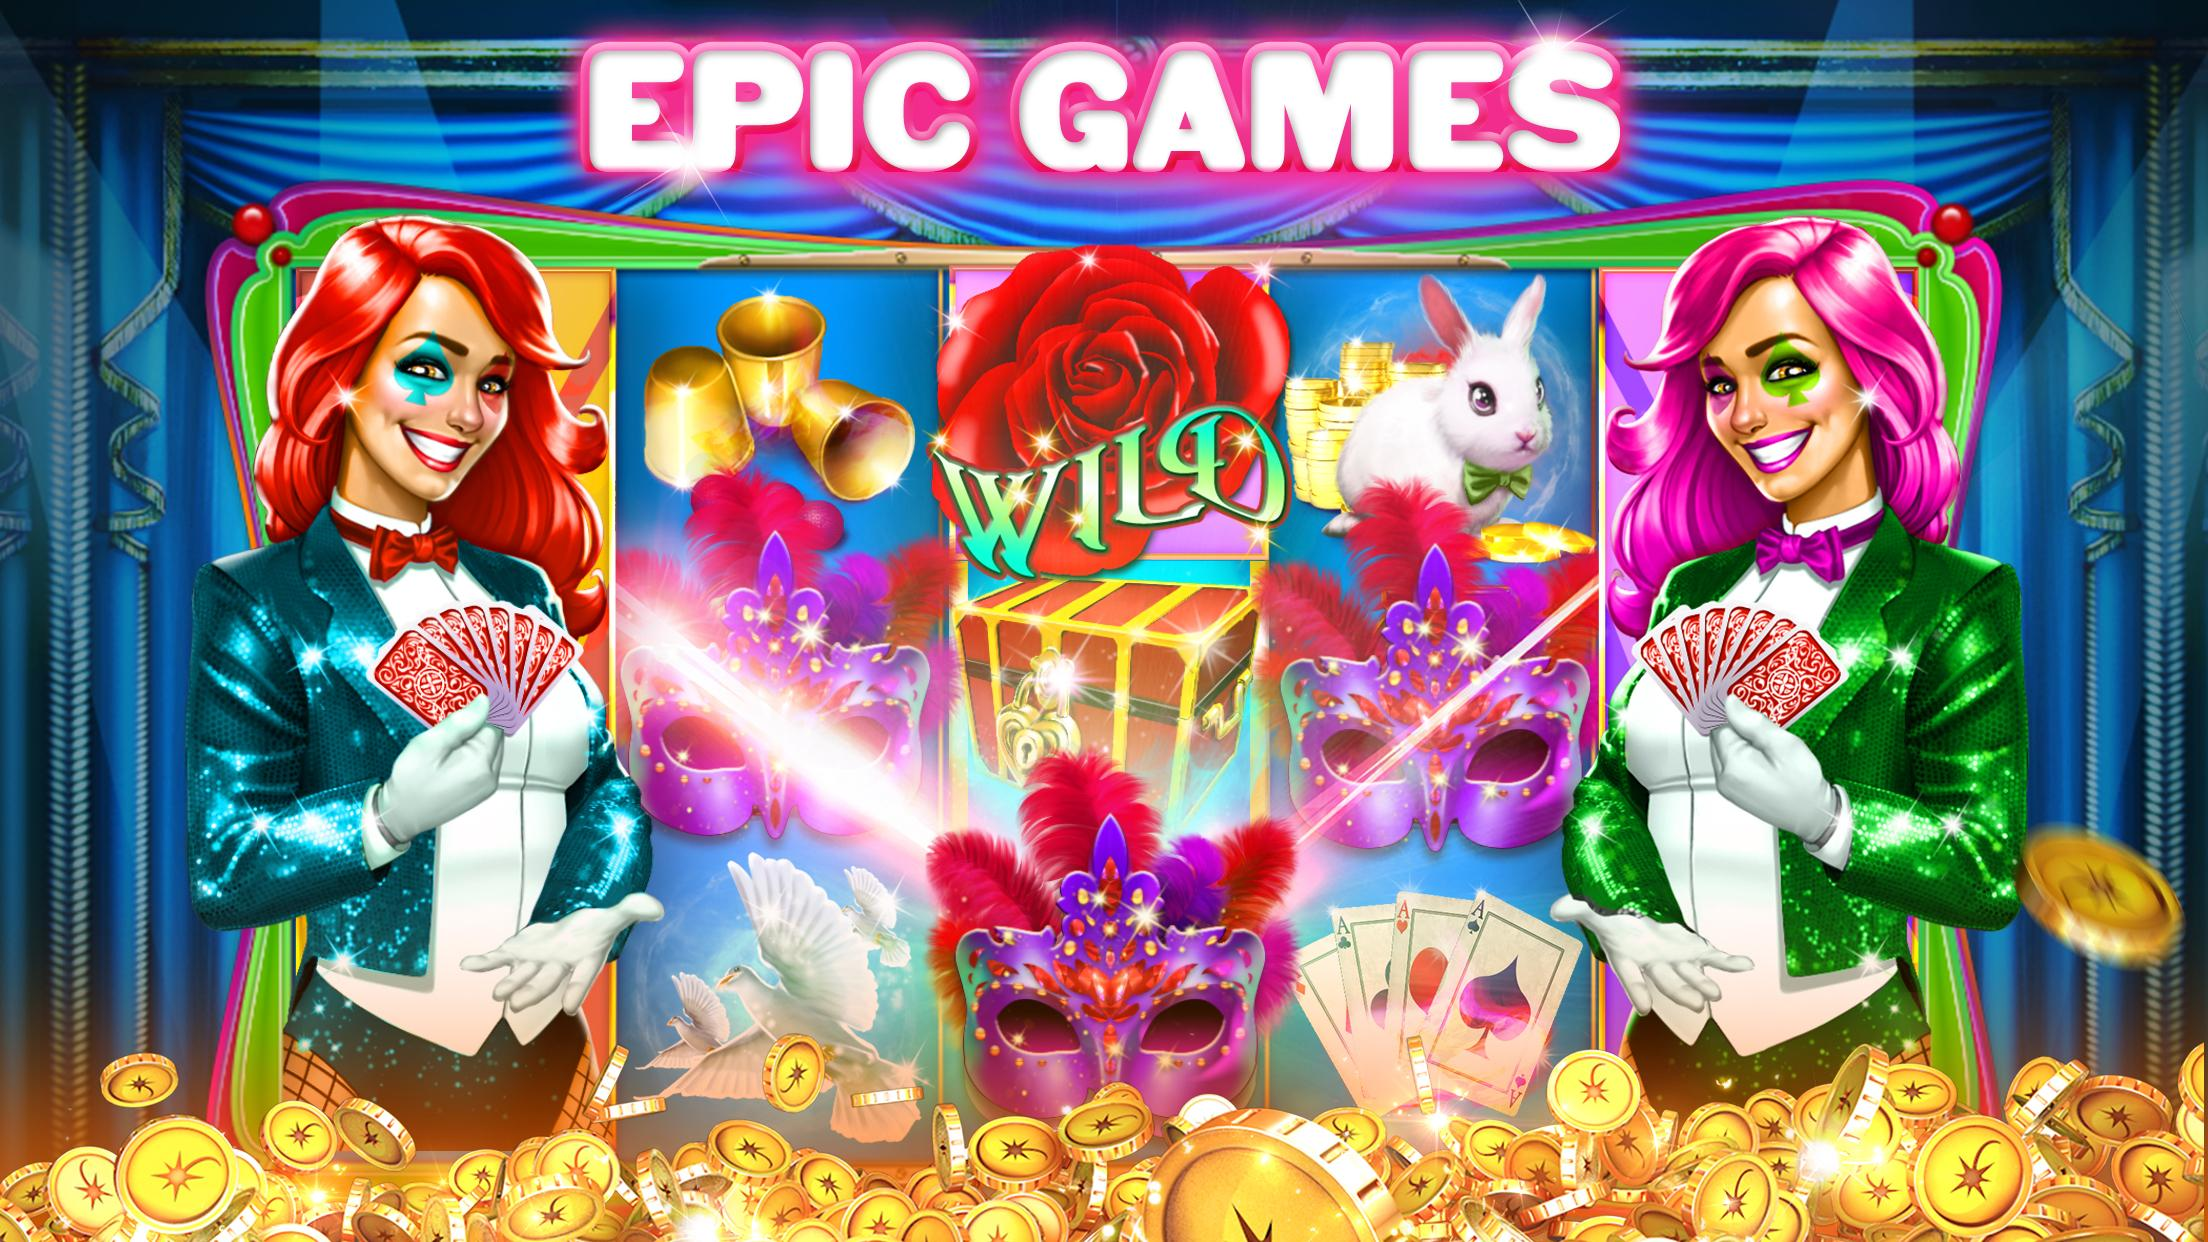 Jackpotjoy Slots Slot machines with Bonus Games 26.0.05 Screenshot 17